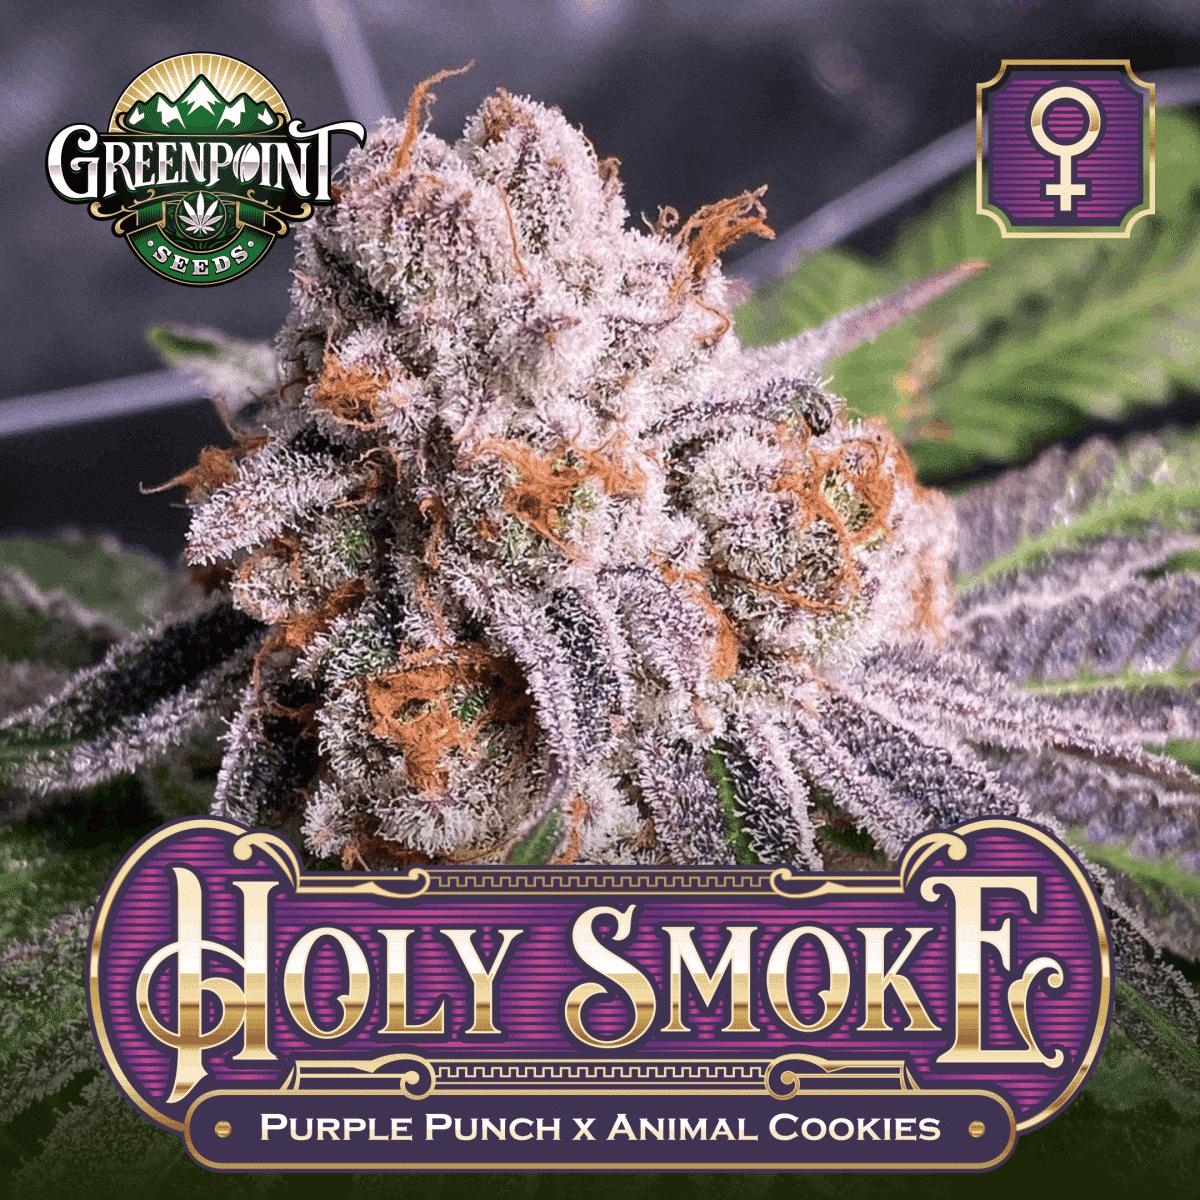 Holy Smoke Feminized Cannabis Seeds